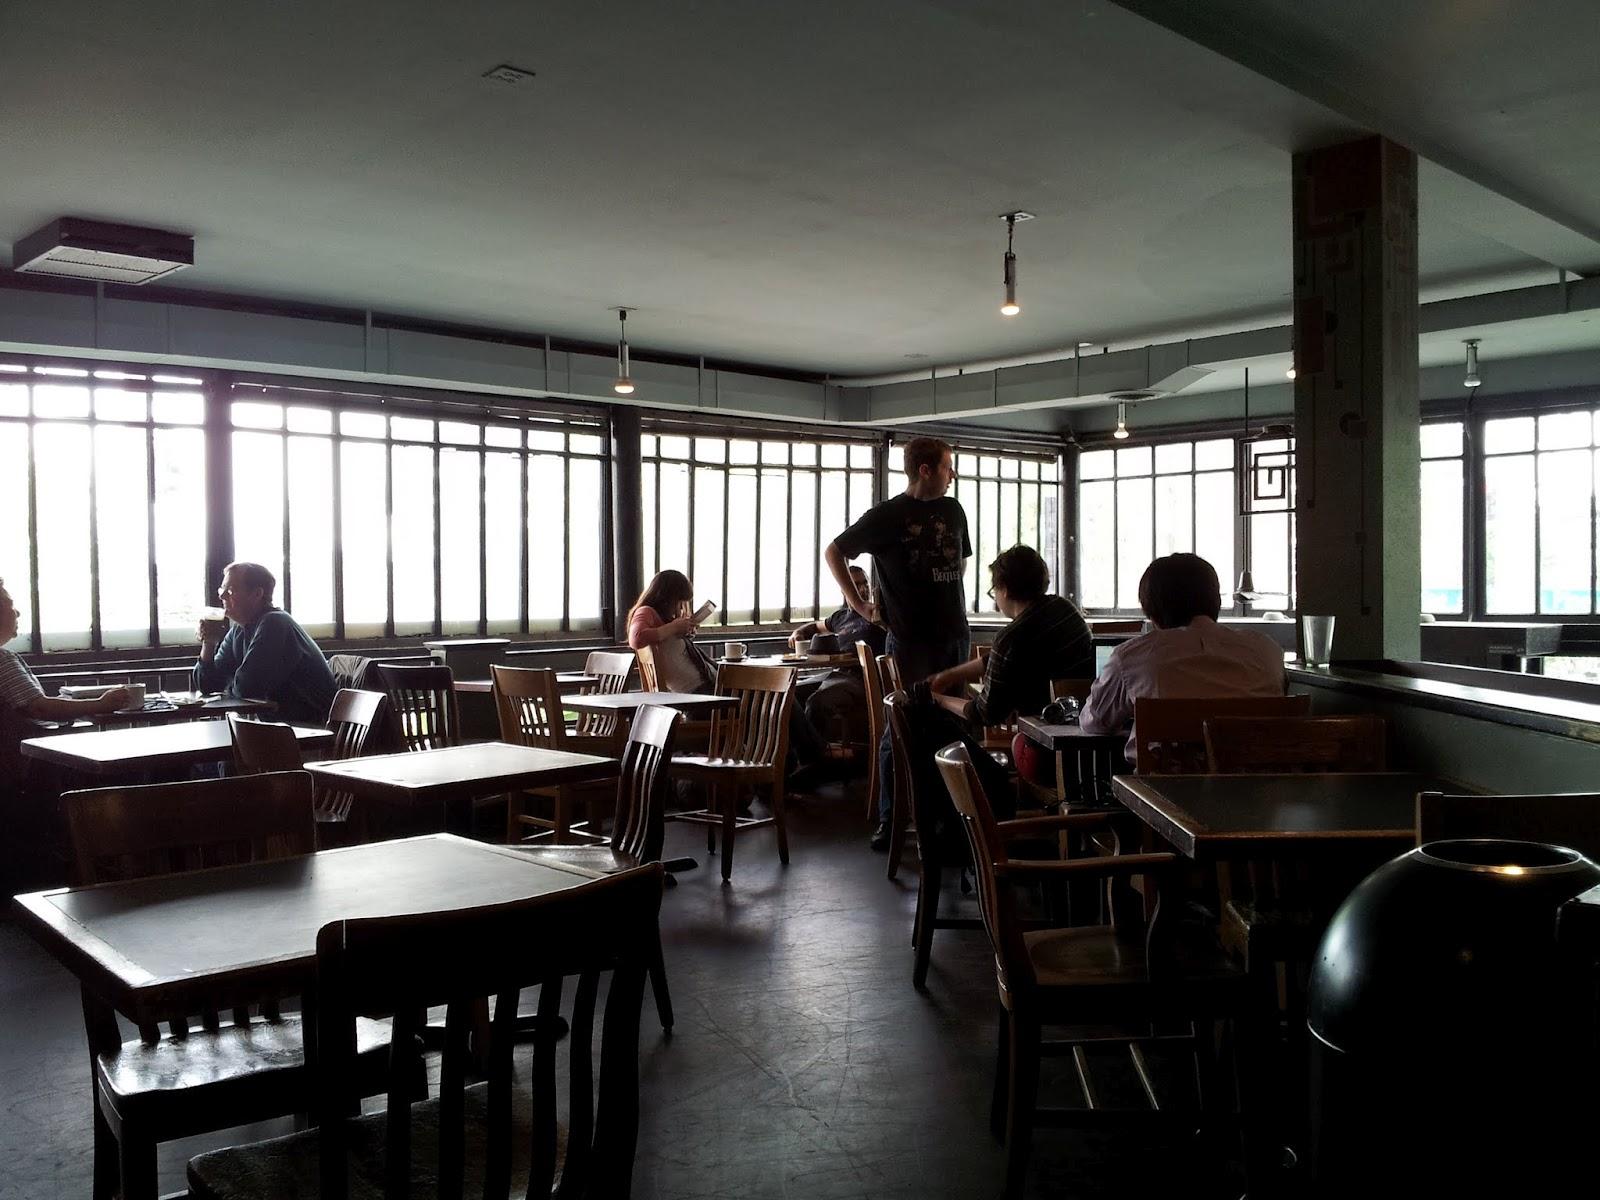 Interior Design Classes Seattle By Seattleflyerguy U0027s All Purpose Travel Blog Top 15 Coffee